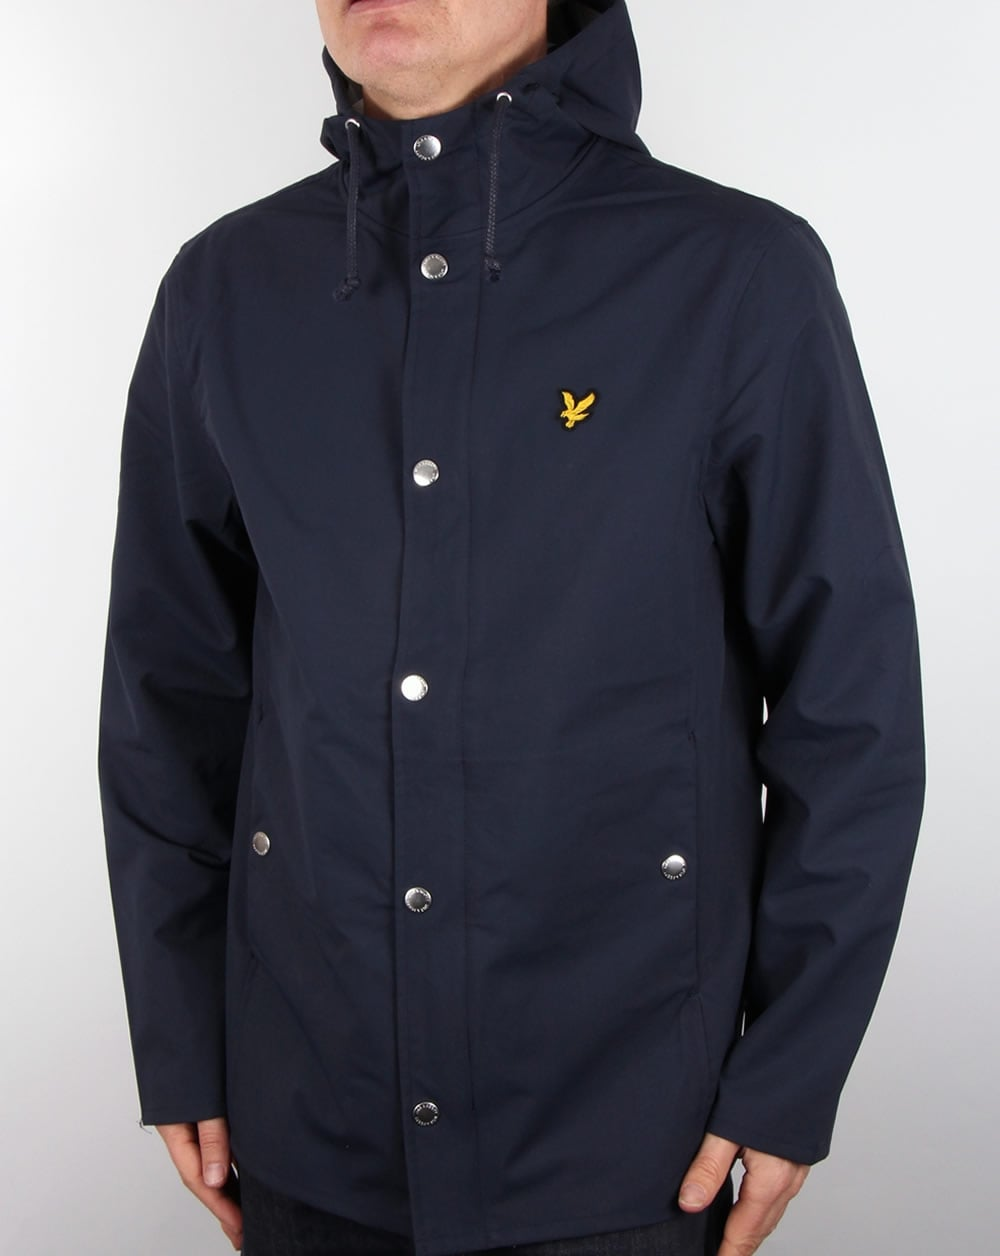 lyle and scott zip front raincoat navy jacket mens coat hooded. Black Bedroom Furniture Sets. Home Design Ideas